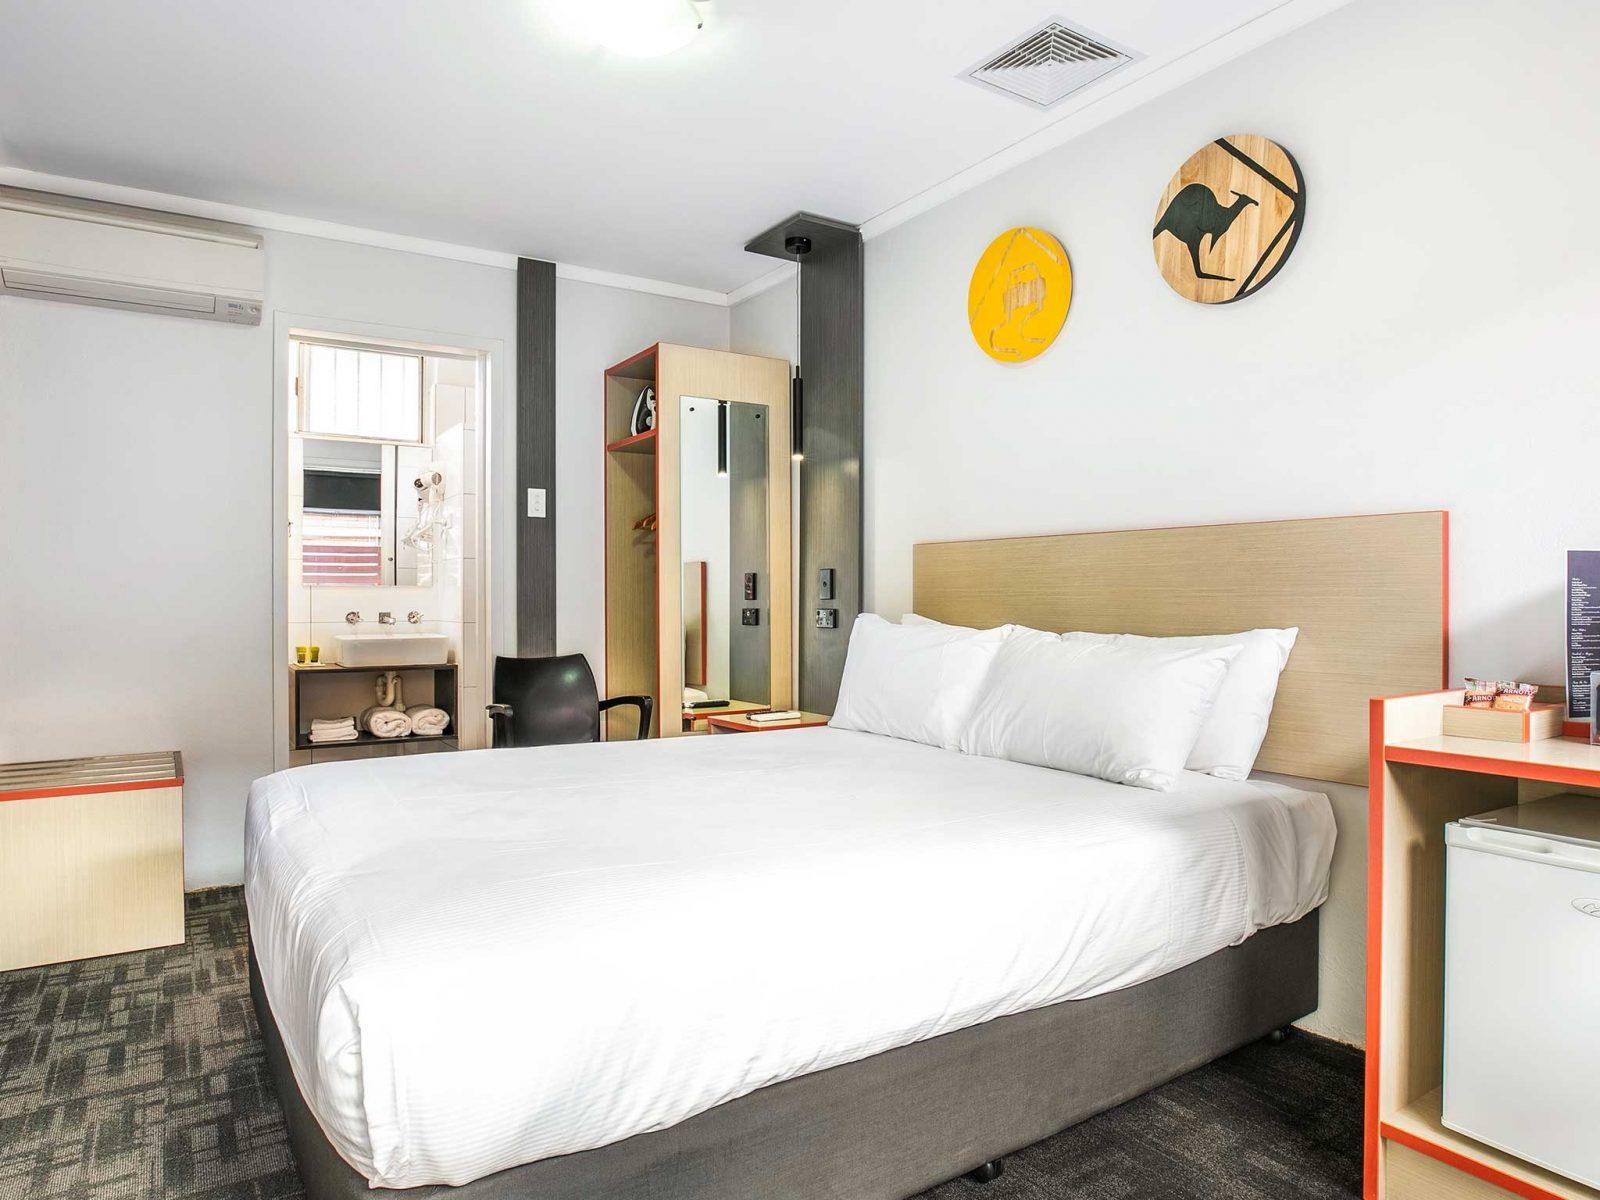 bed in Motel room